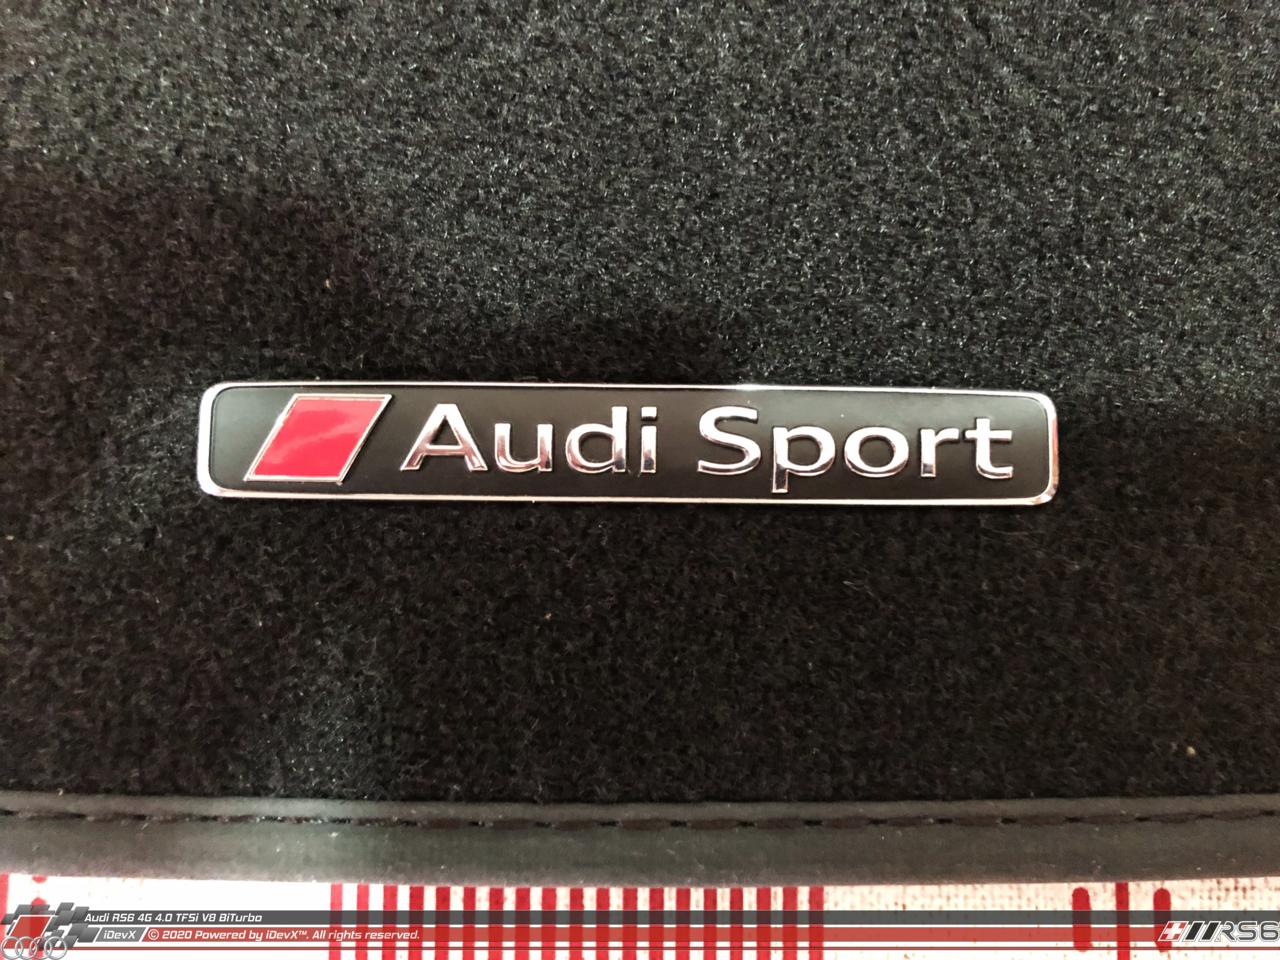 15_08.2019_Audi-RS6_iDevX_007.png